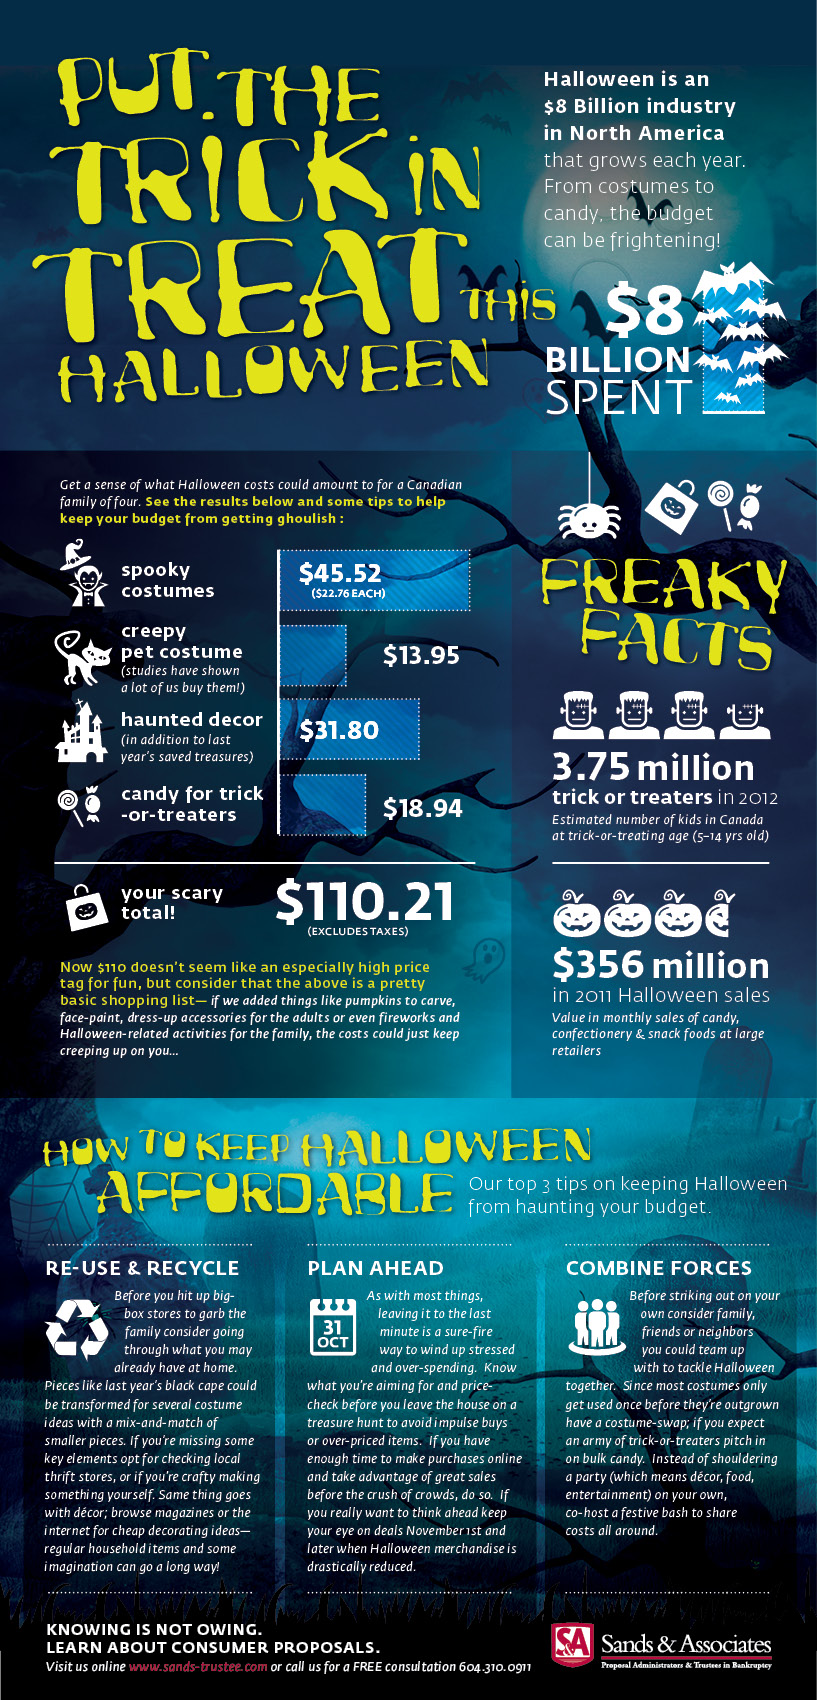 Sands & Associates put the trick in treat Halloween spending infographic